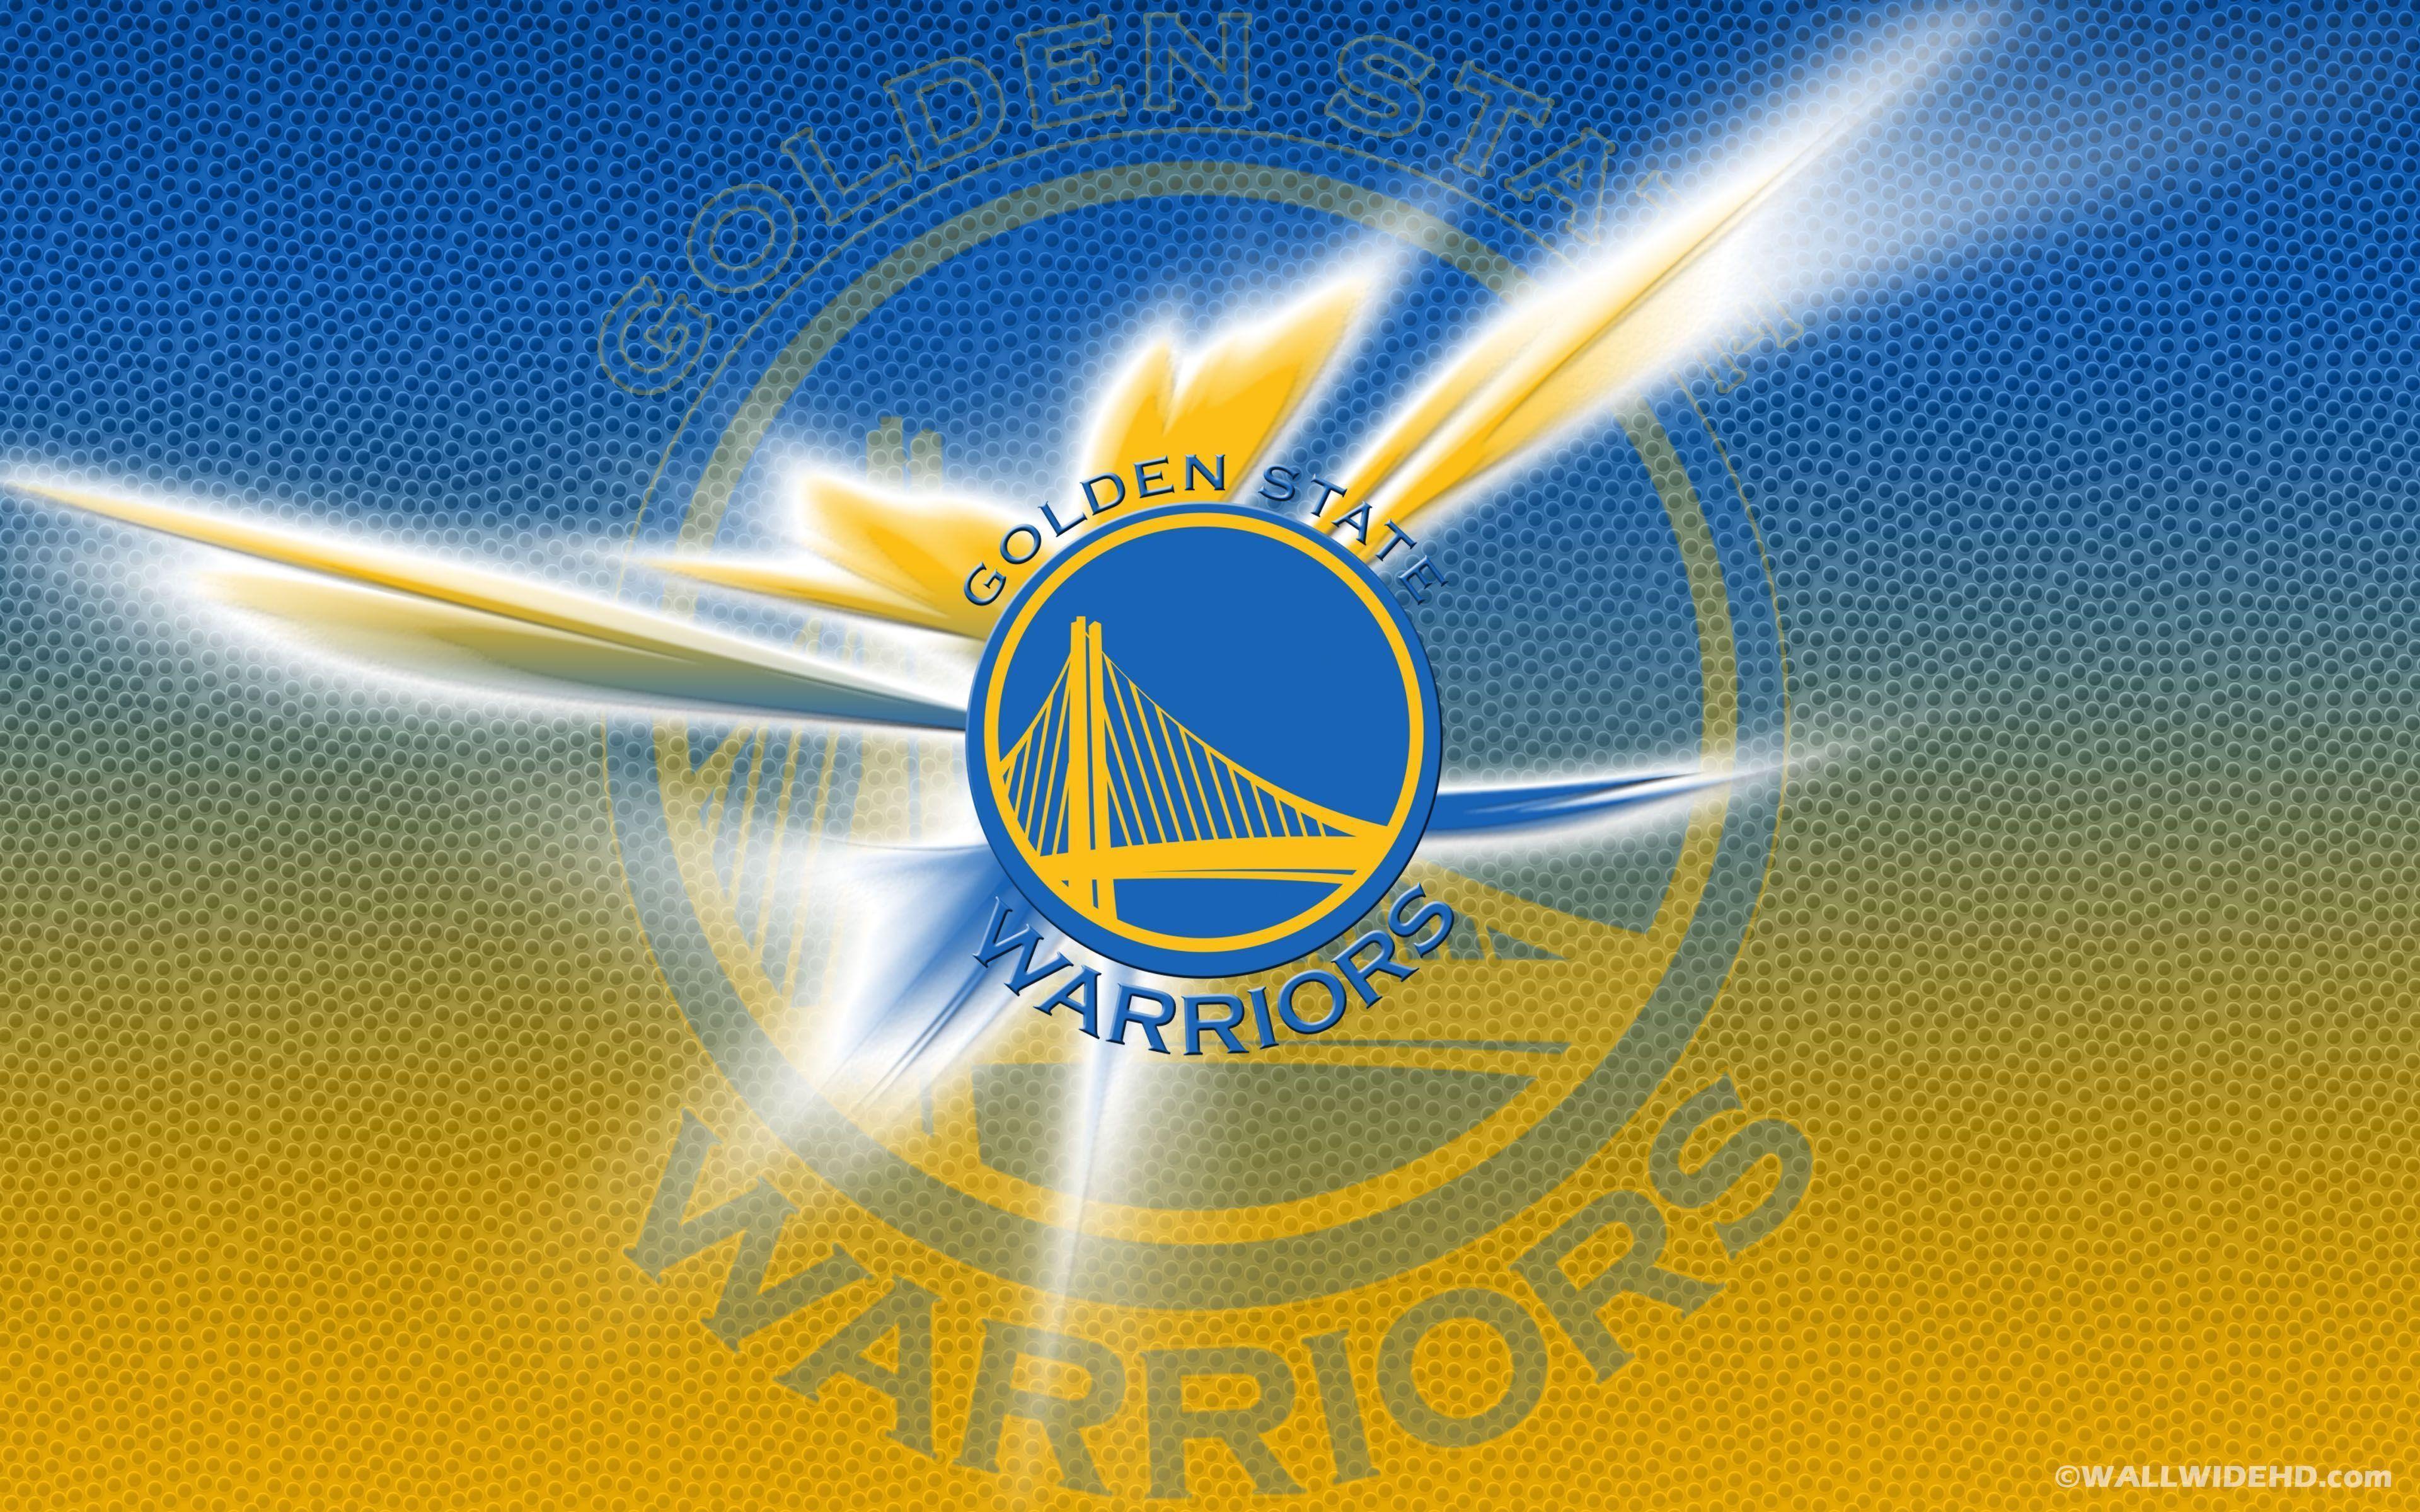 Golden State Warriors Wallpapers Top Free Golden State Warriors Backgrounds Wallpaperaccess